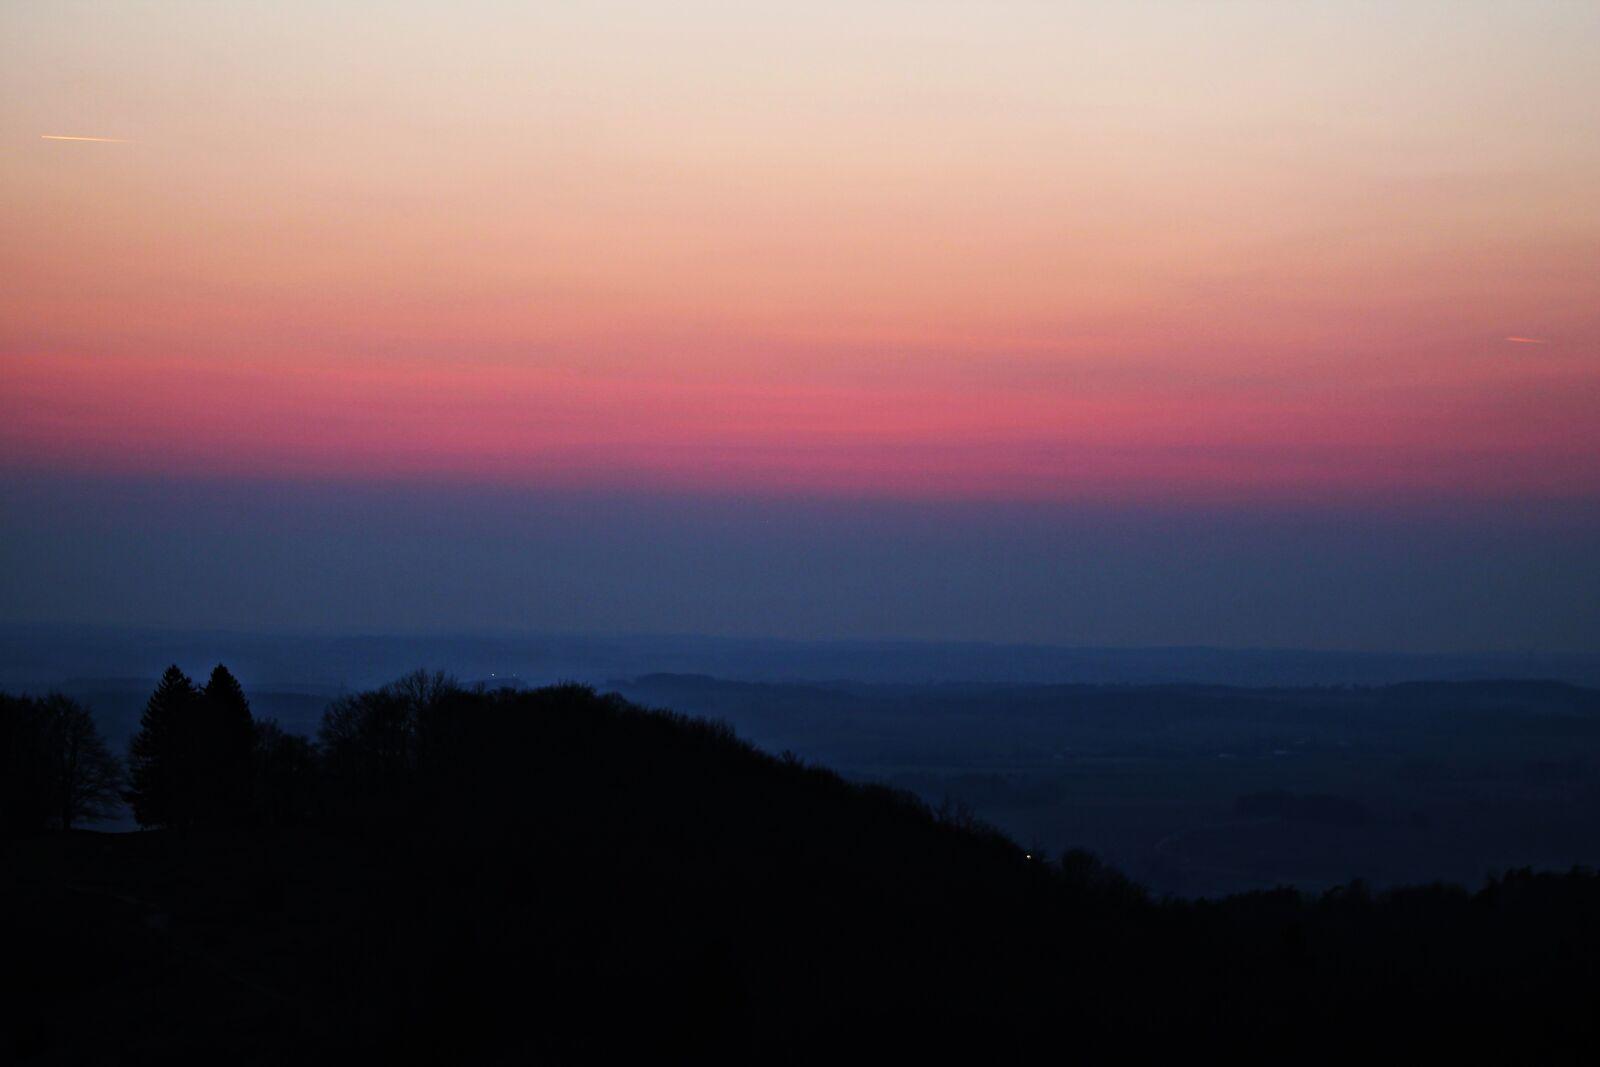 "Canon EOS 1100D (EOS Rebel T3 / EOS Kiss X50) sample photo. ""Twilight, silhouette, landscape"" photography"